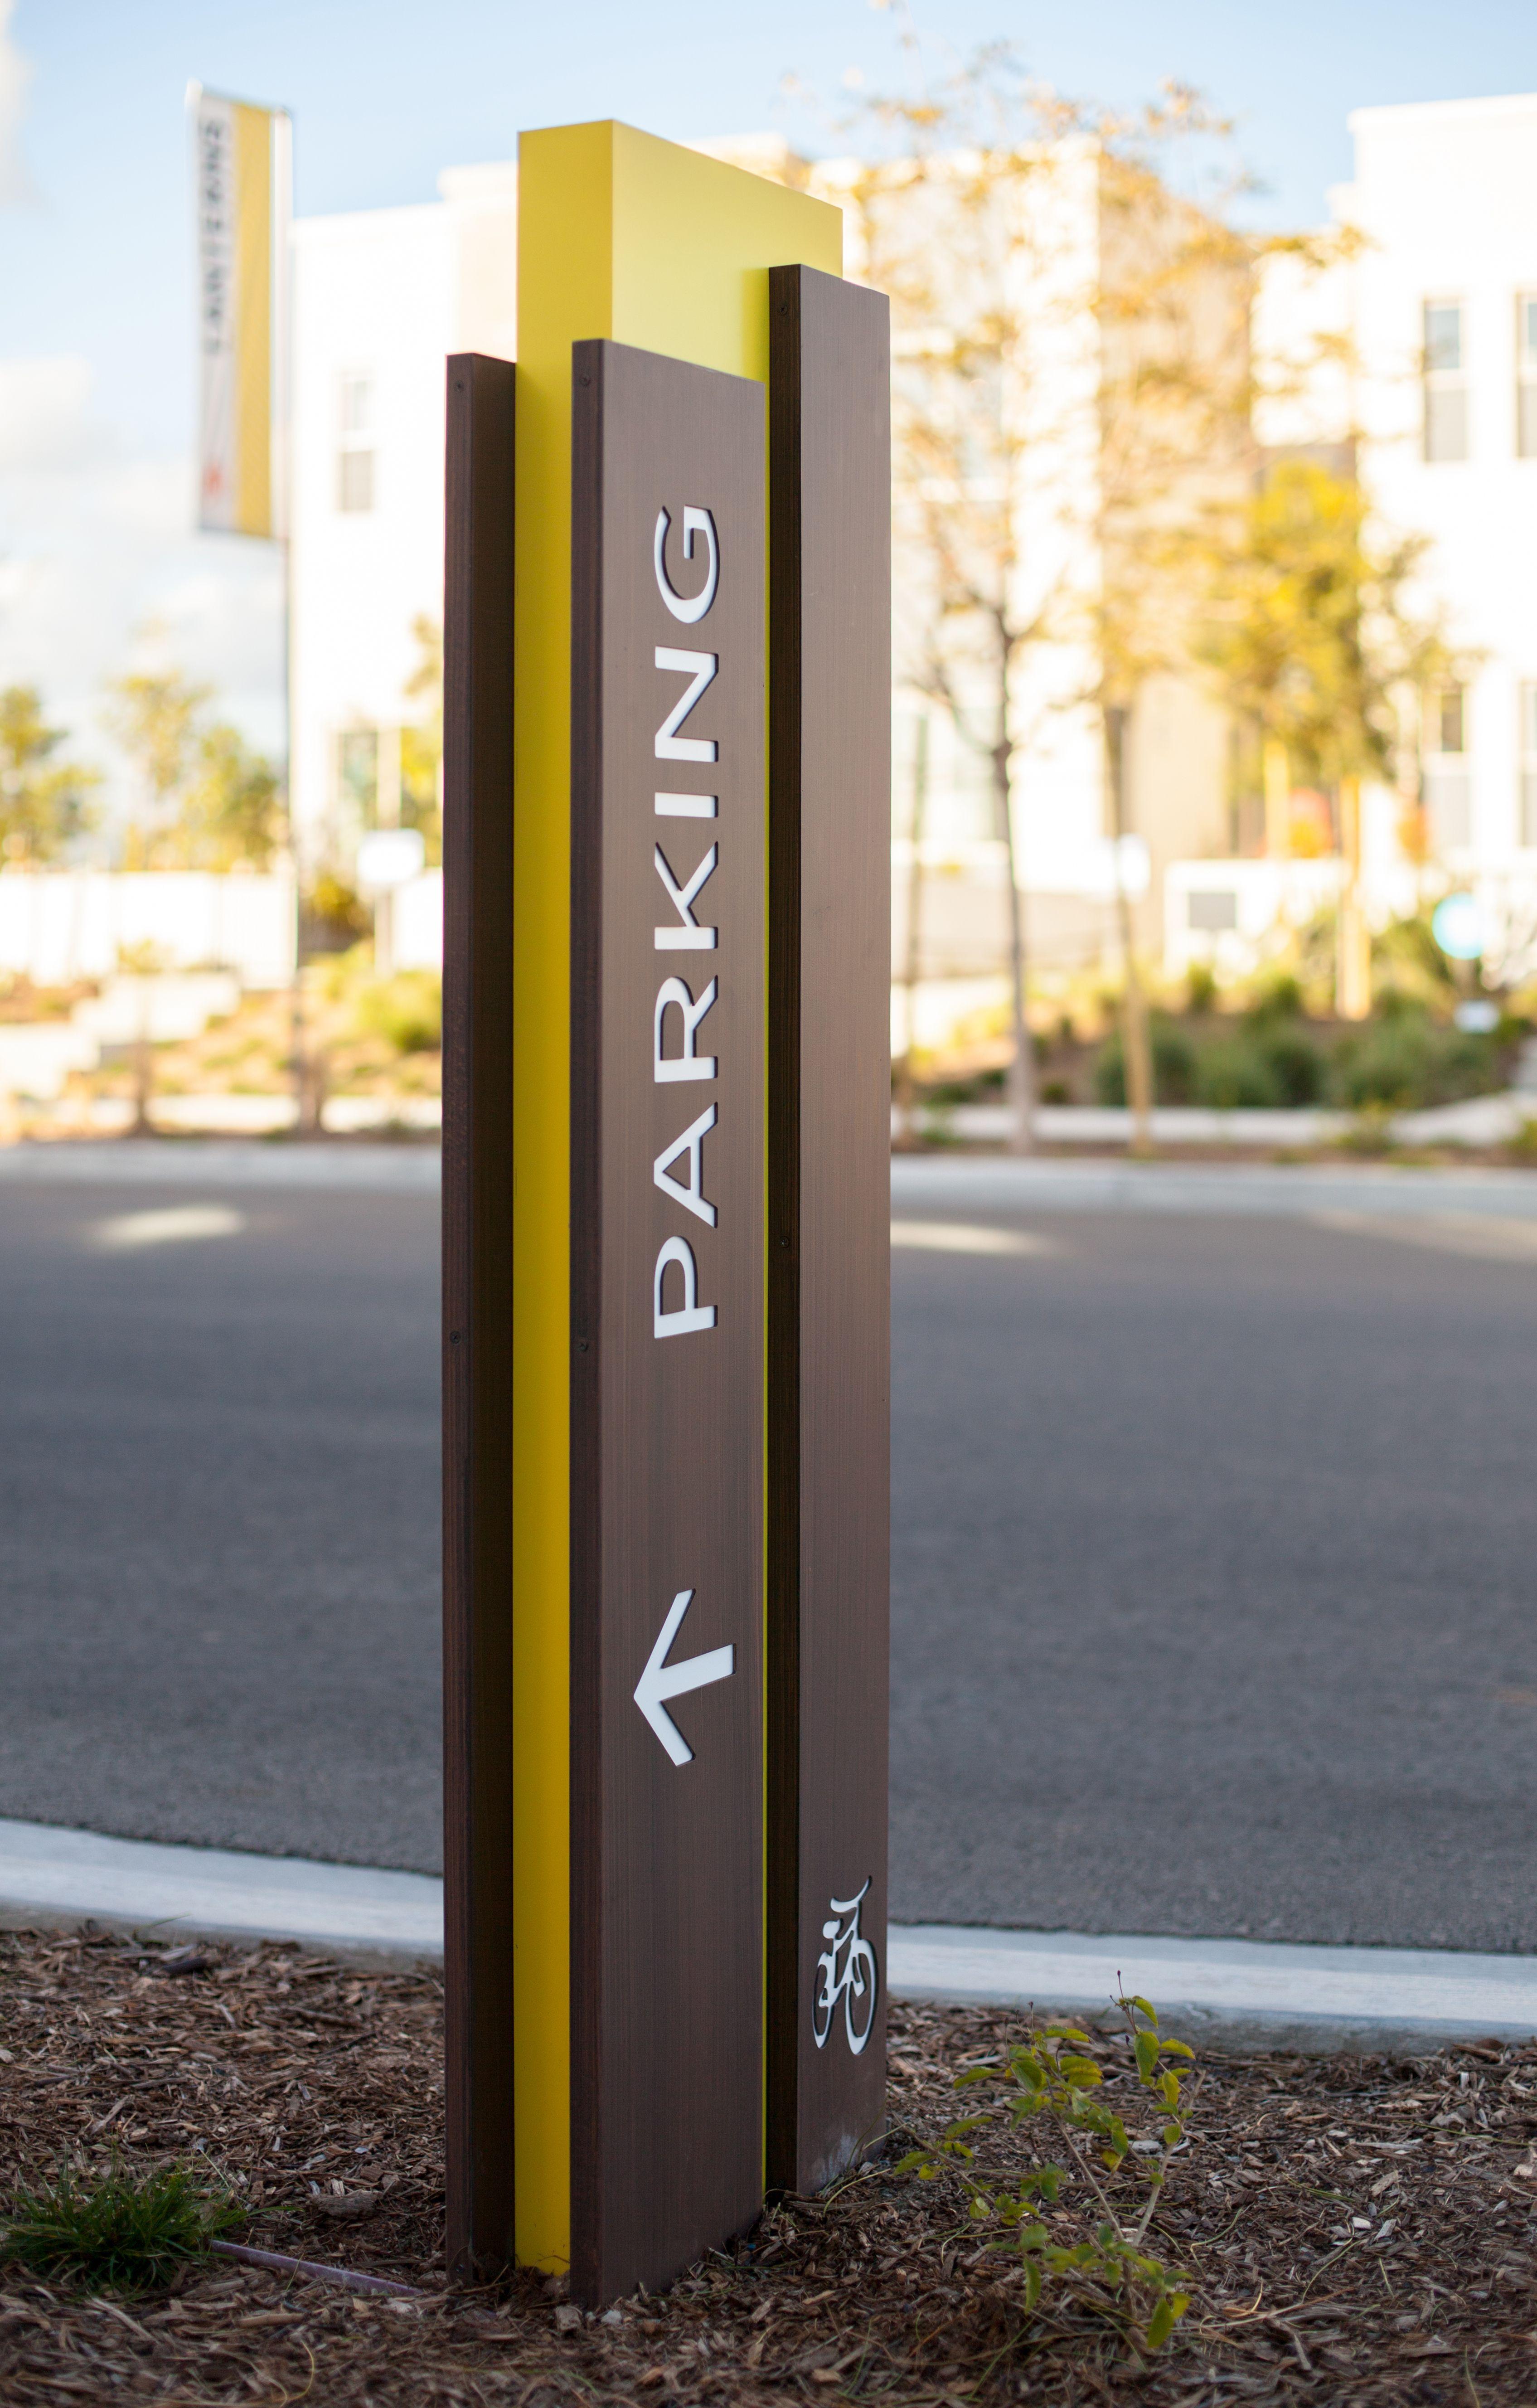 Parasol Park Portfolio With Images Wayfinding Signage Design